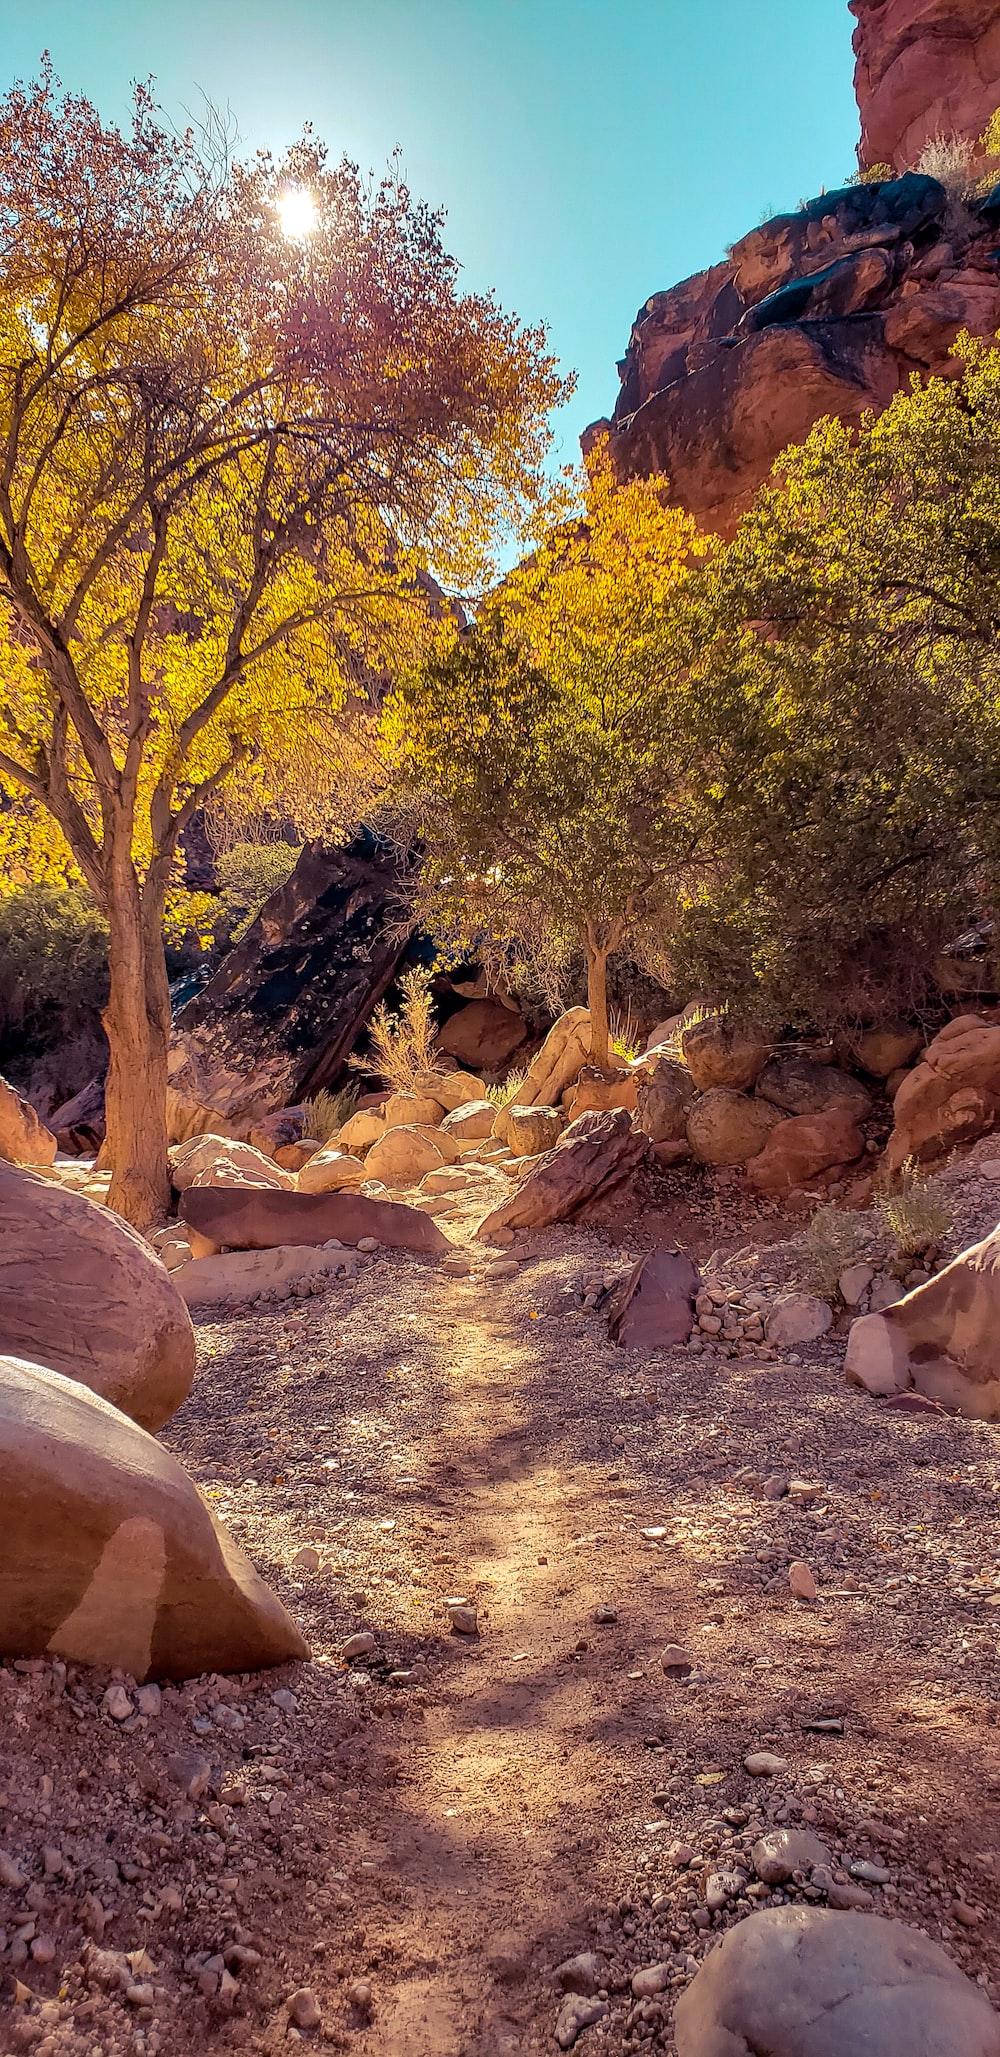 green-leafed trees near boulder rocks